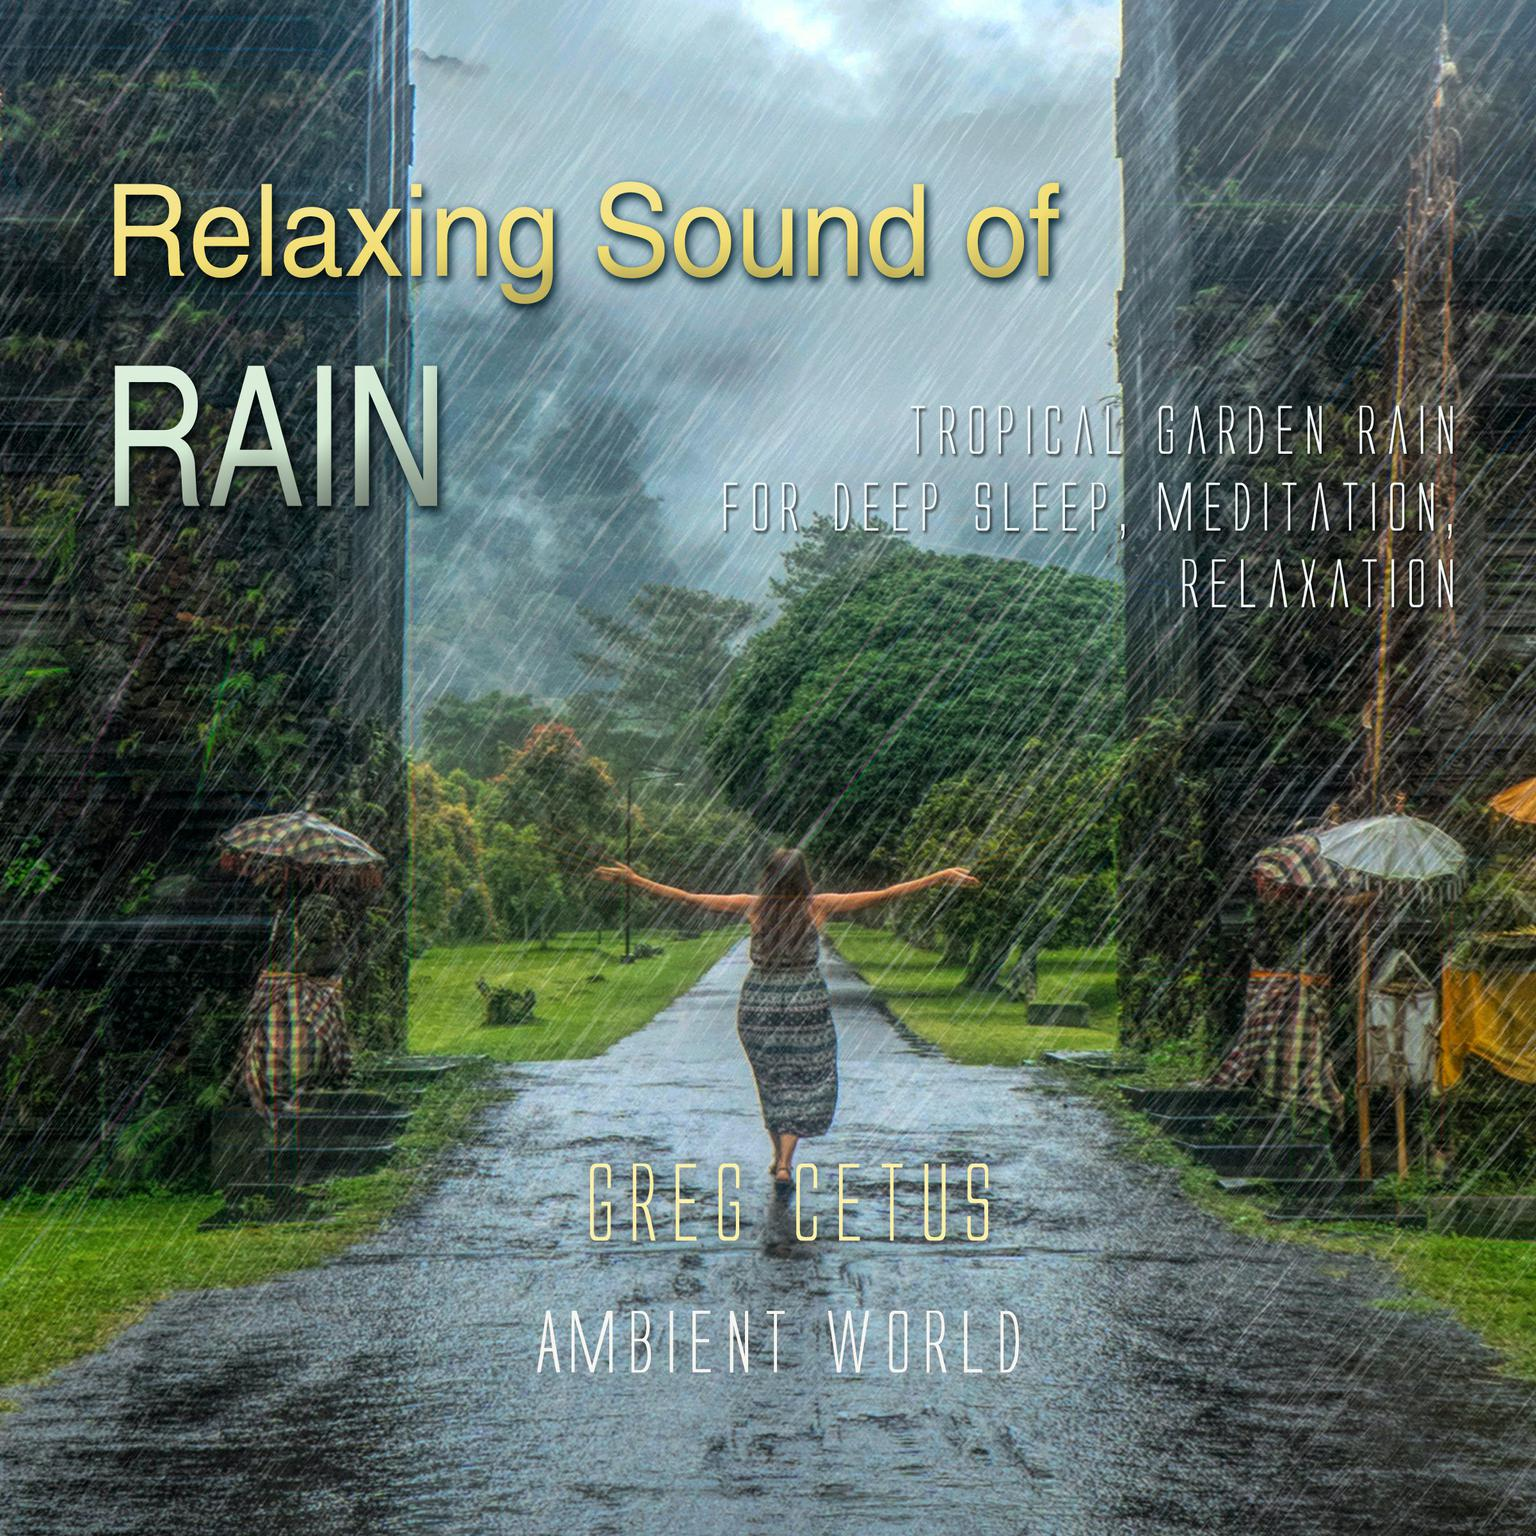 Relaxing Sound of Rain: Tropical Garden Rain for Deep Sleep, Meditation, Relaxation Audiobook, by Greg Cetus